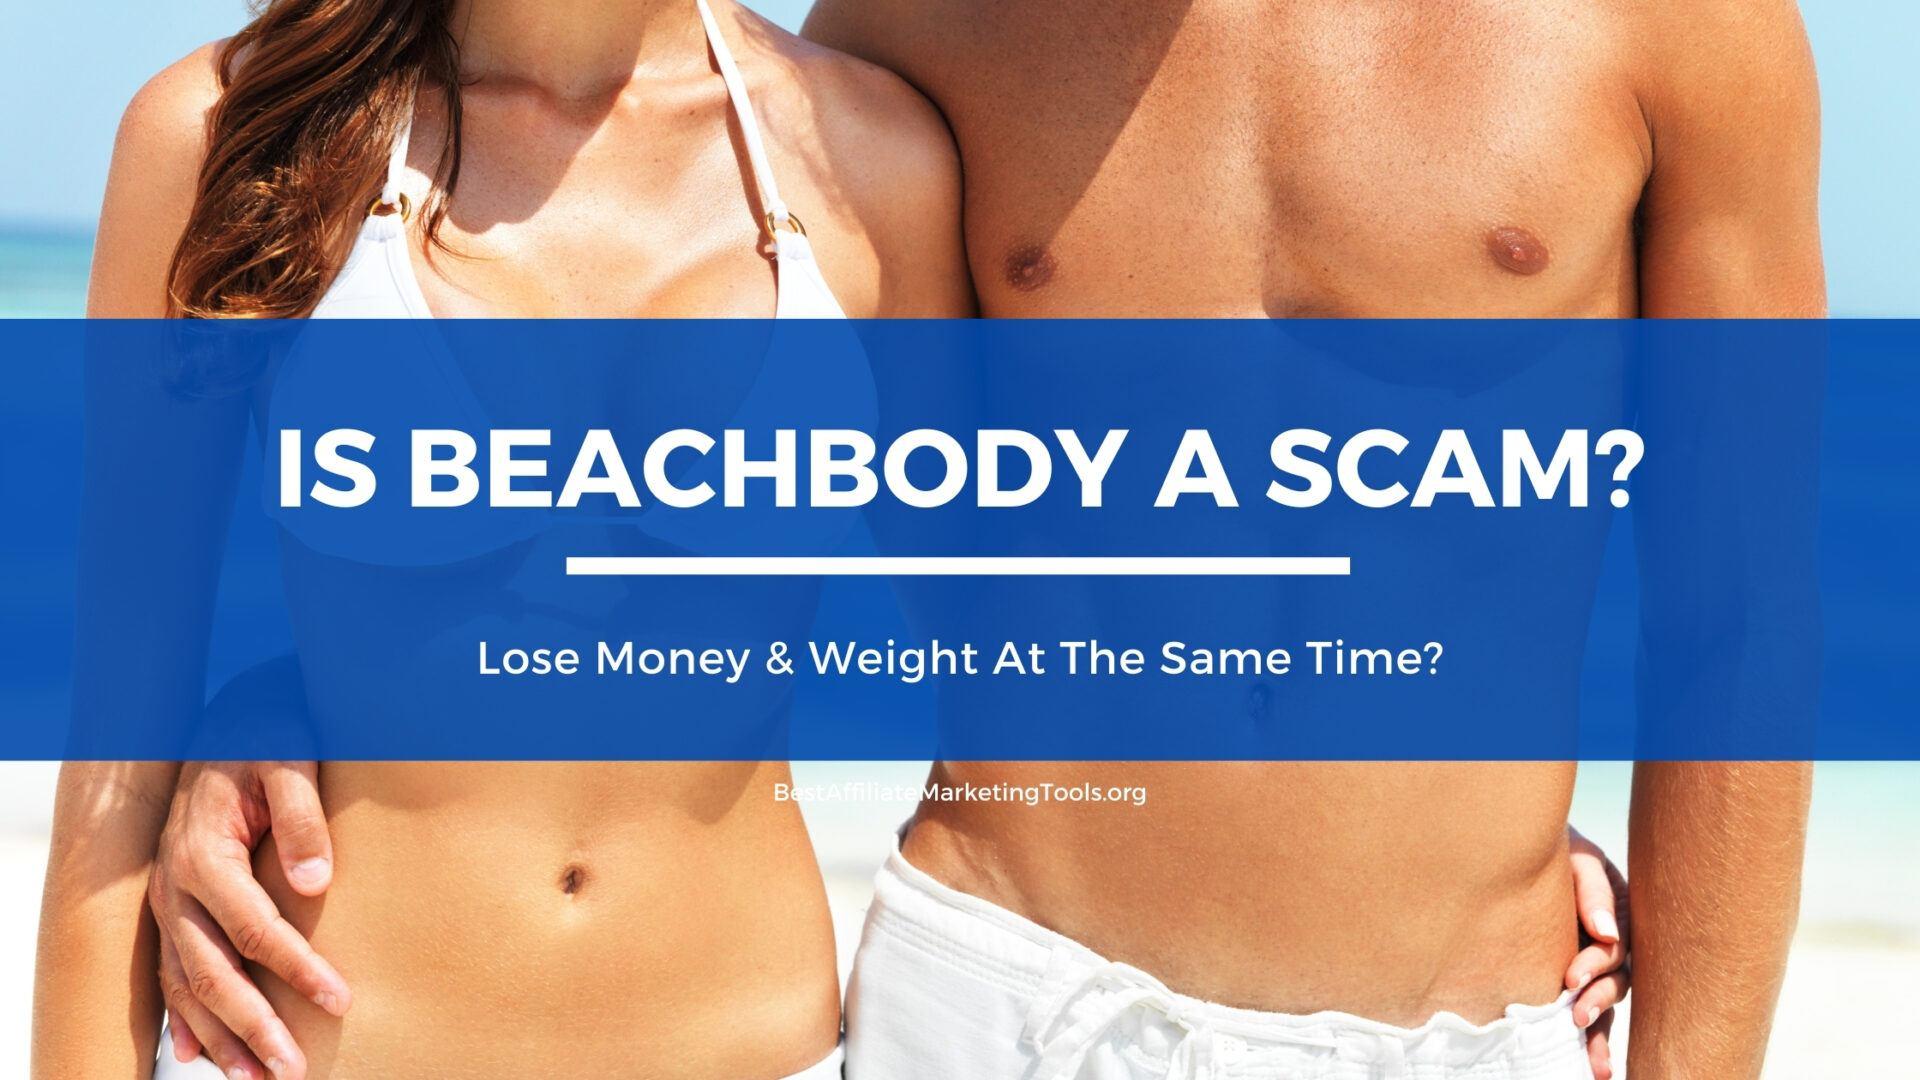 is beachbody a scam